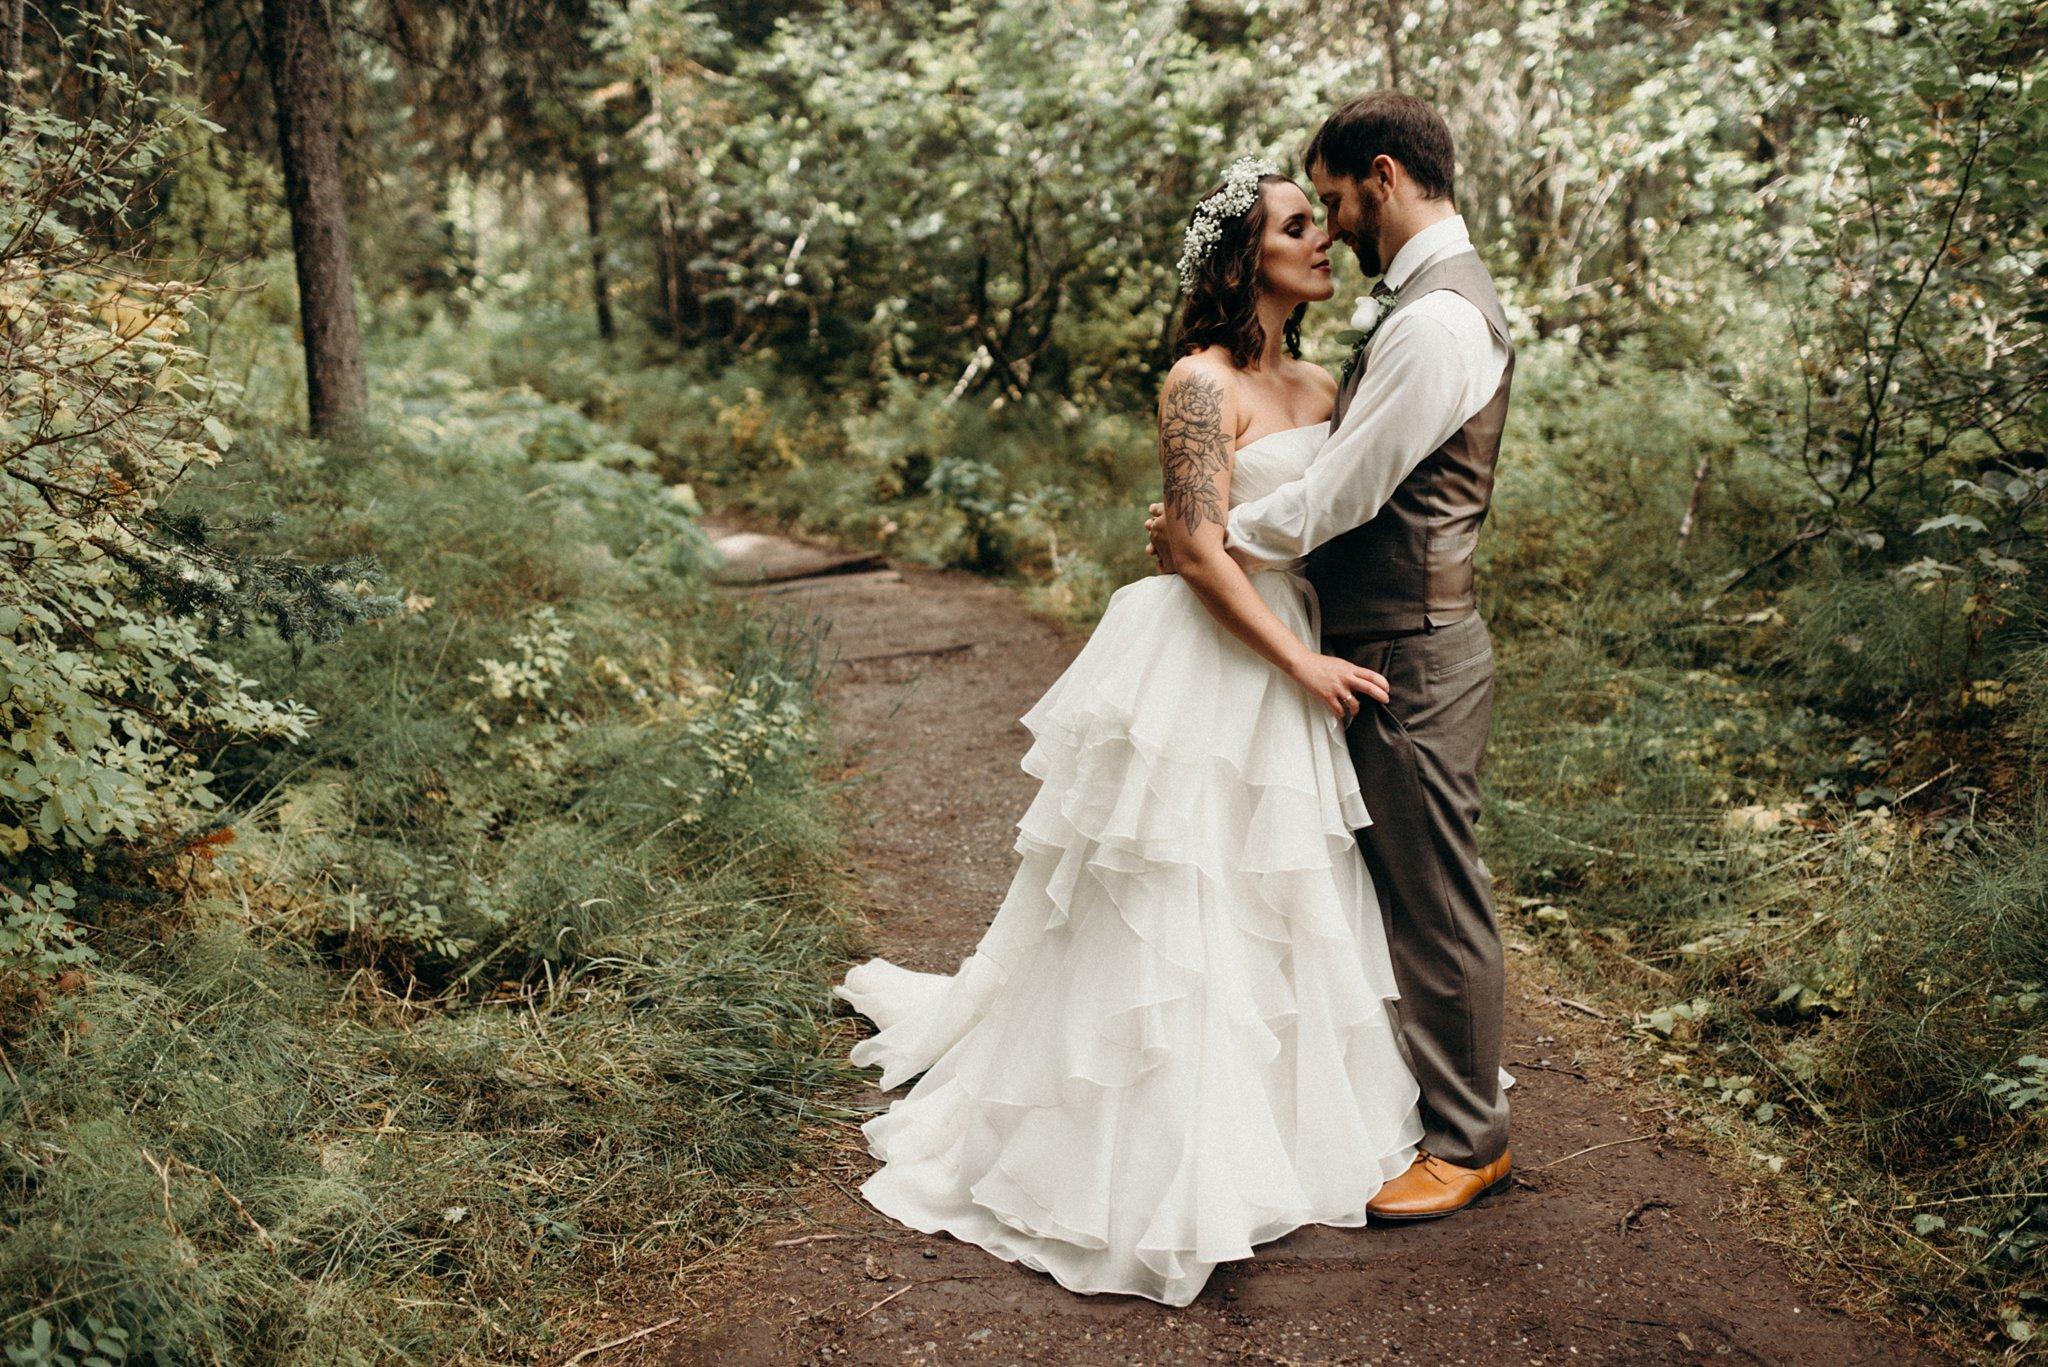 kaihla_tonai_intimate_wedding_elopement_photographer_6888.jpg